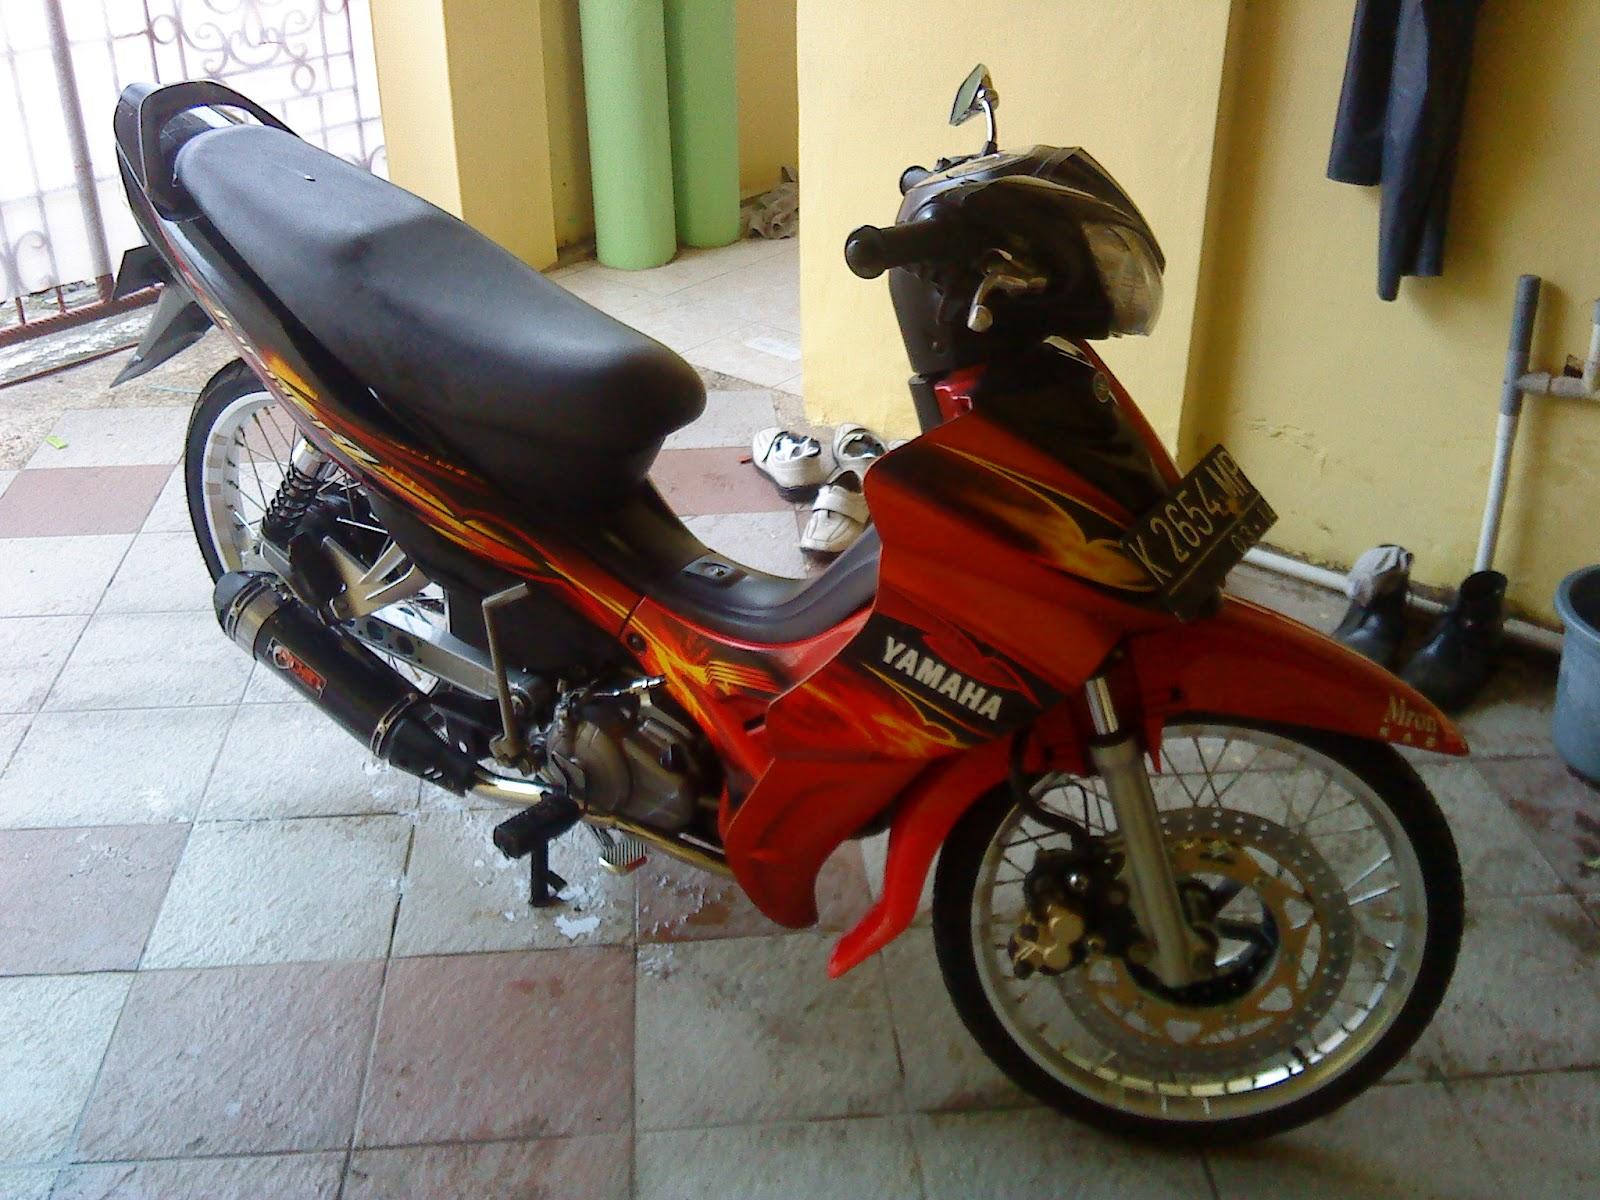 Modif Yamaha Jupiter Mx Velg Jari Jari